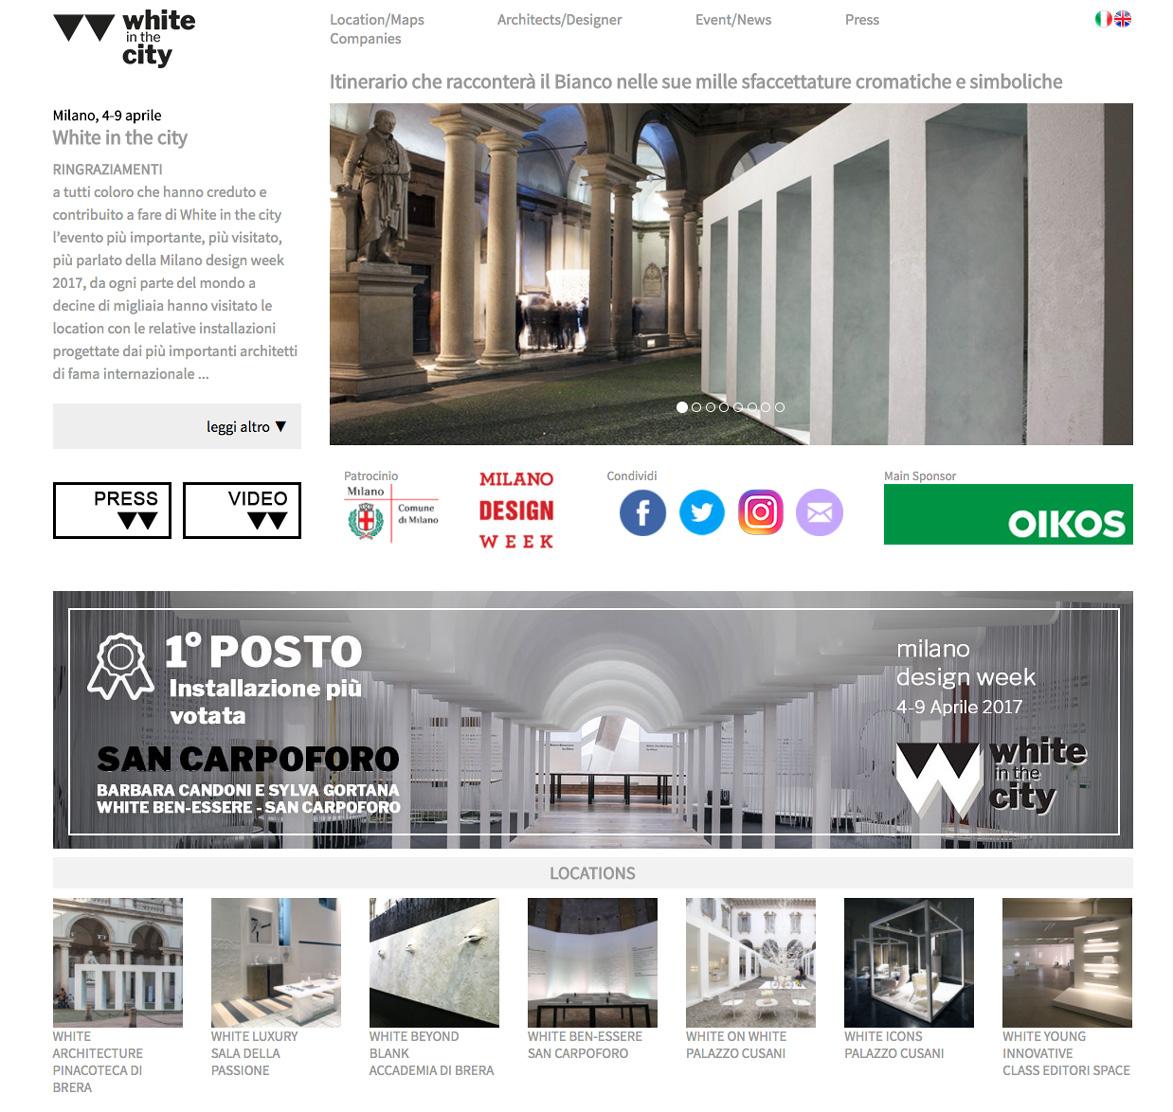 Masellis architetti milano design week